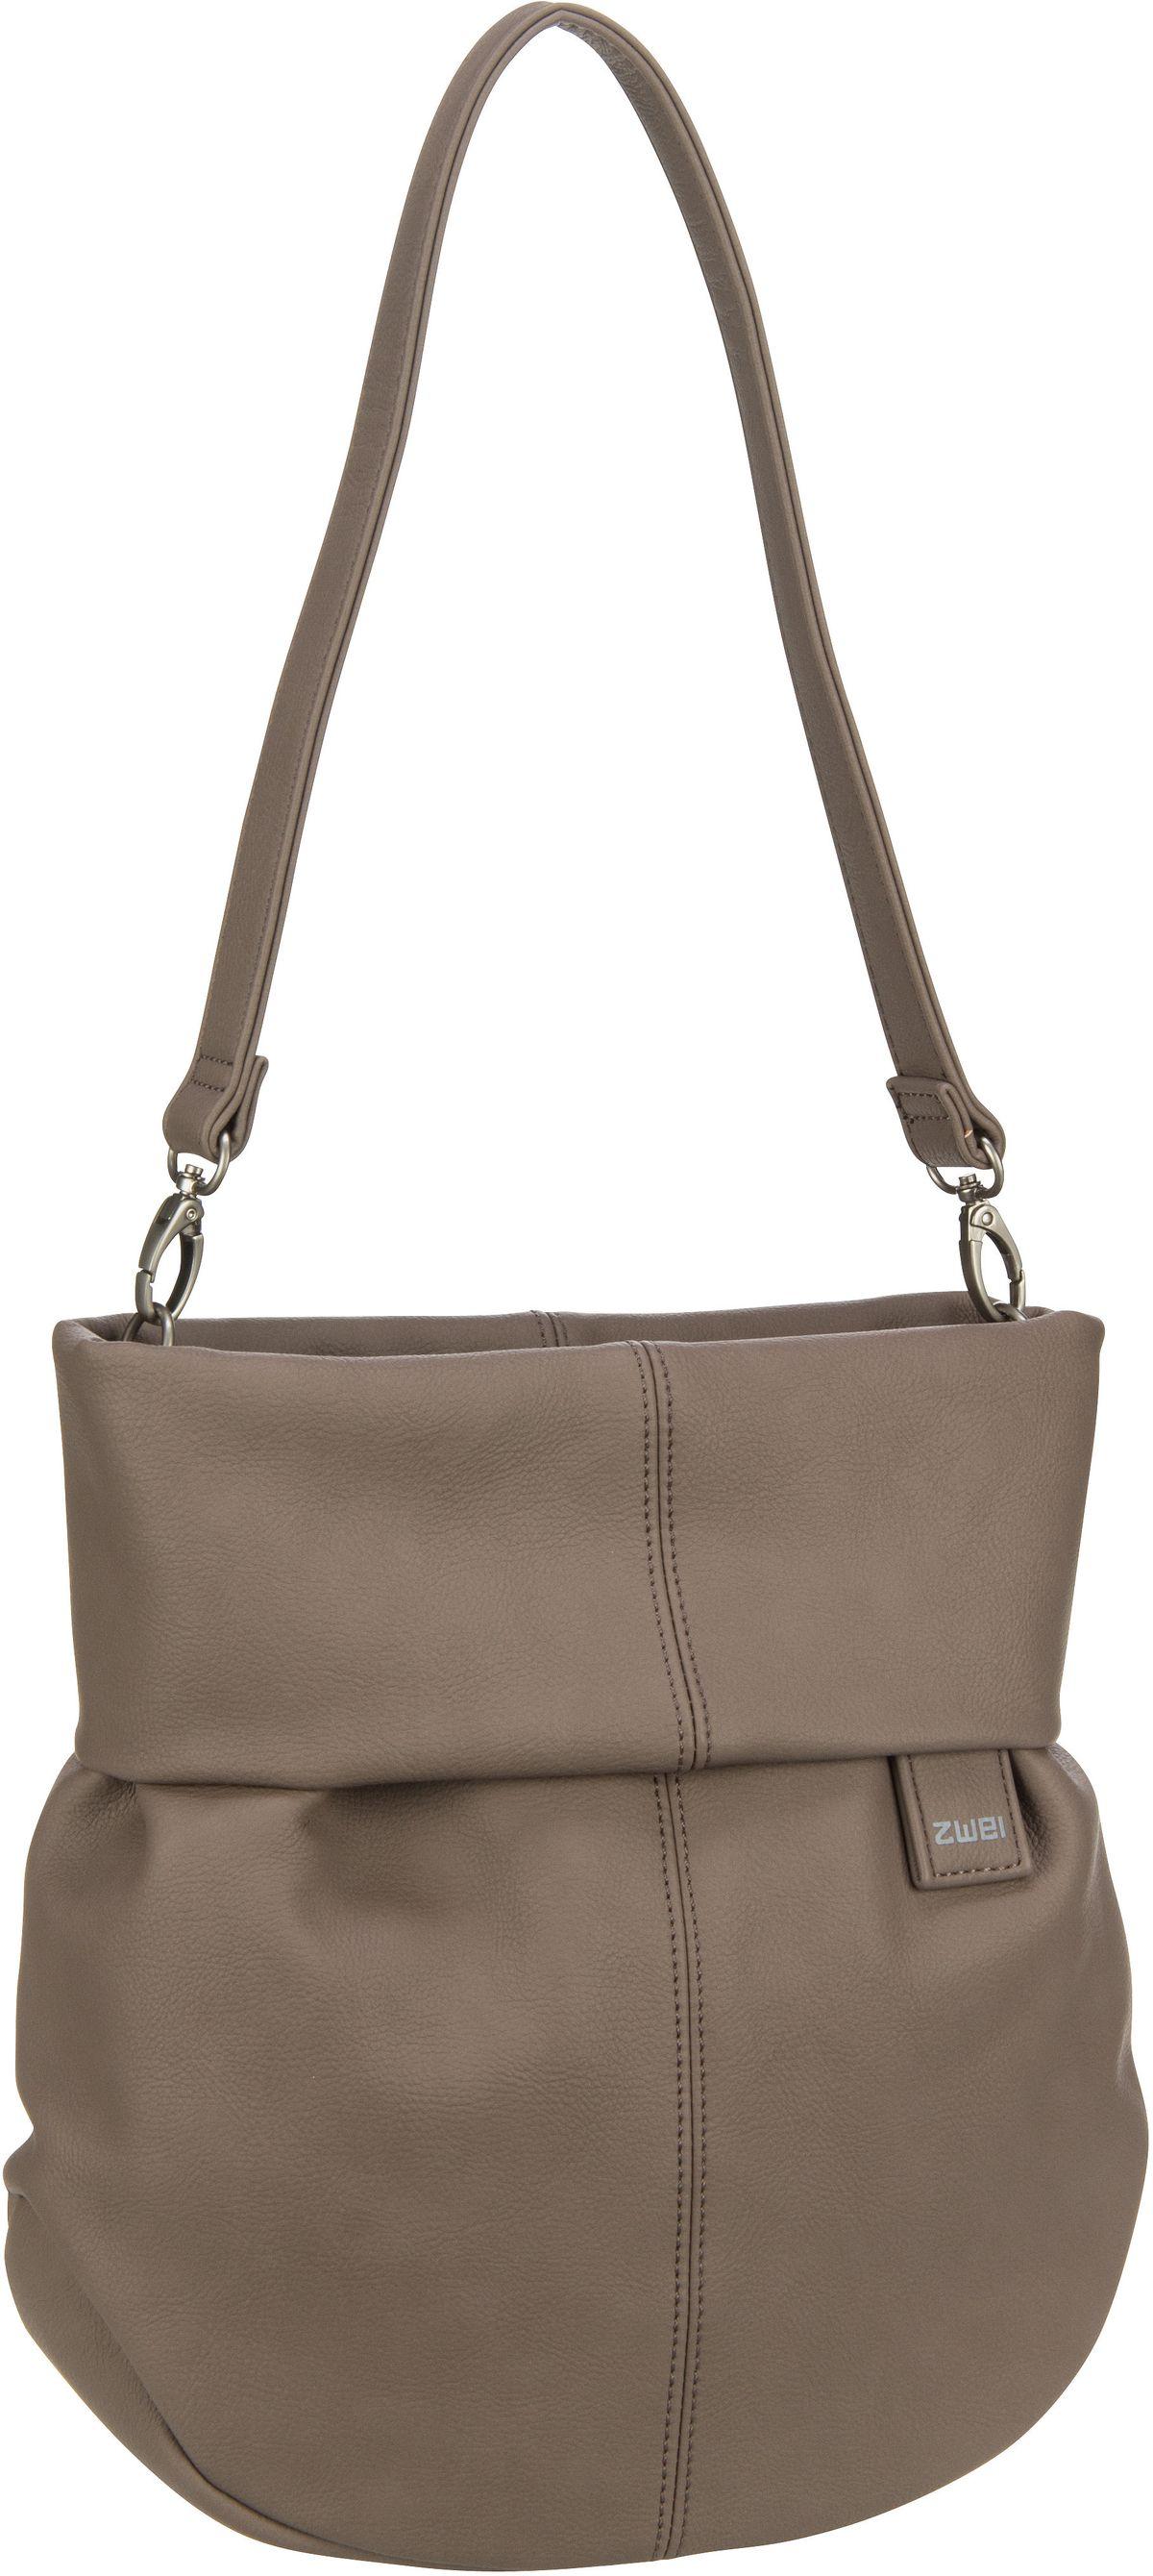 Handtasche Mademoiselle M100 Nubuk/Taupe (5 Liter)